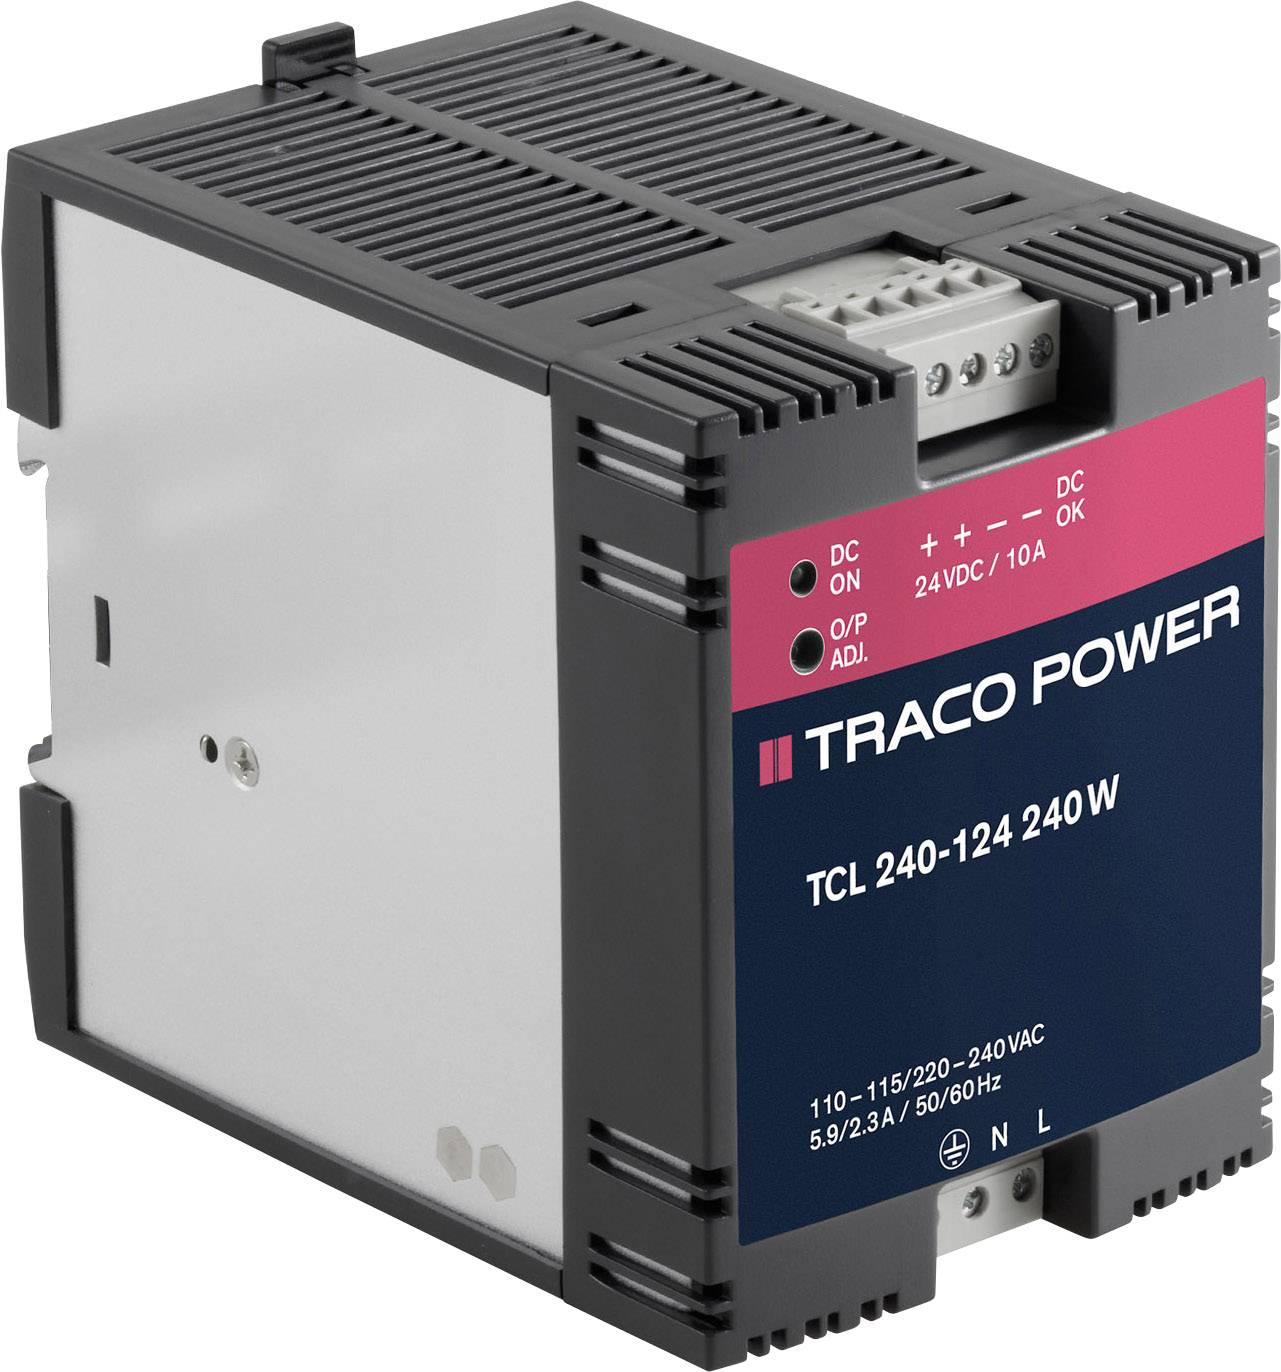 Zdroj na DIN lištu TracoPower TCL 240-124, 24 V/DC, 10 A